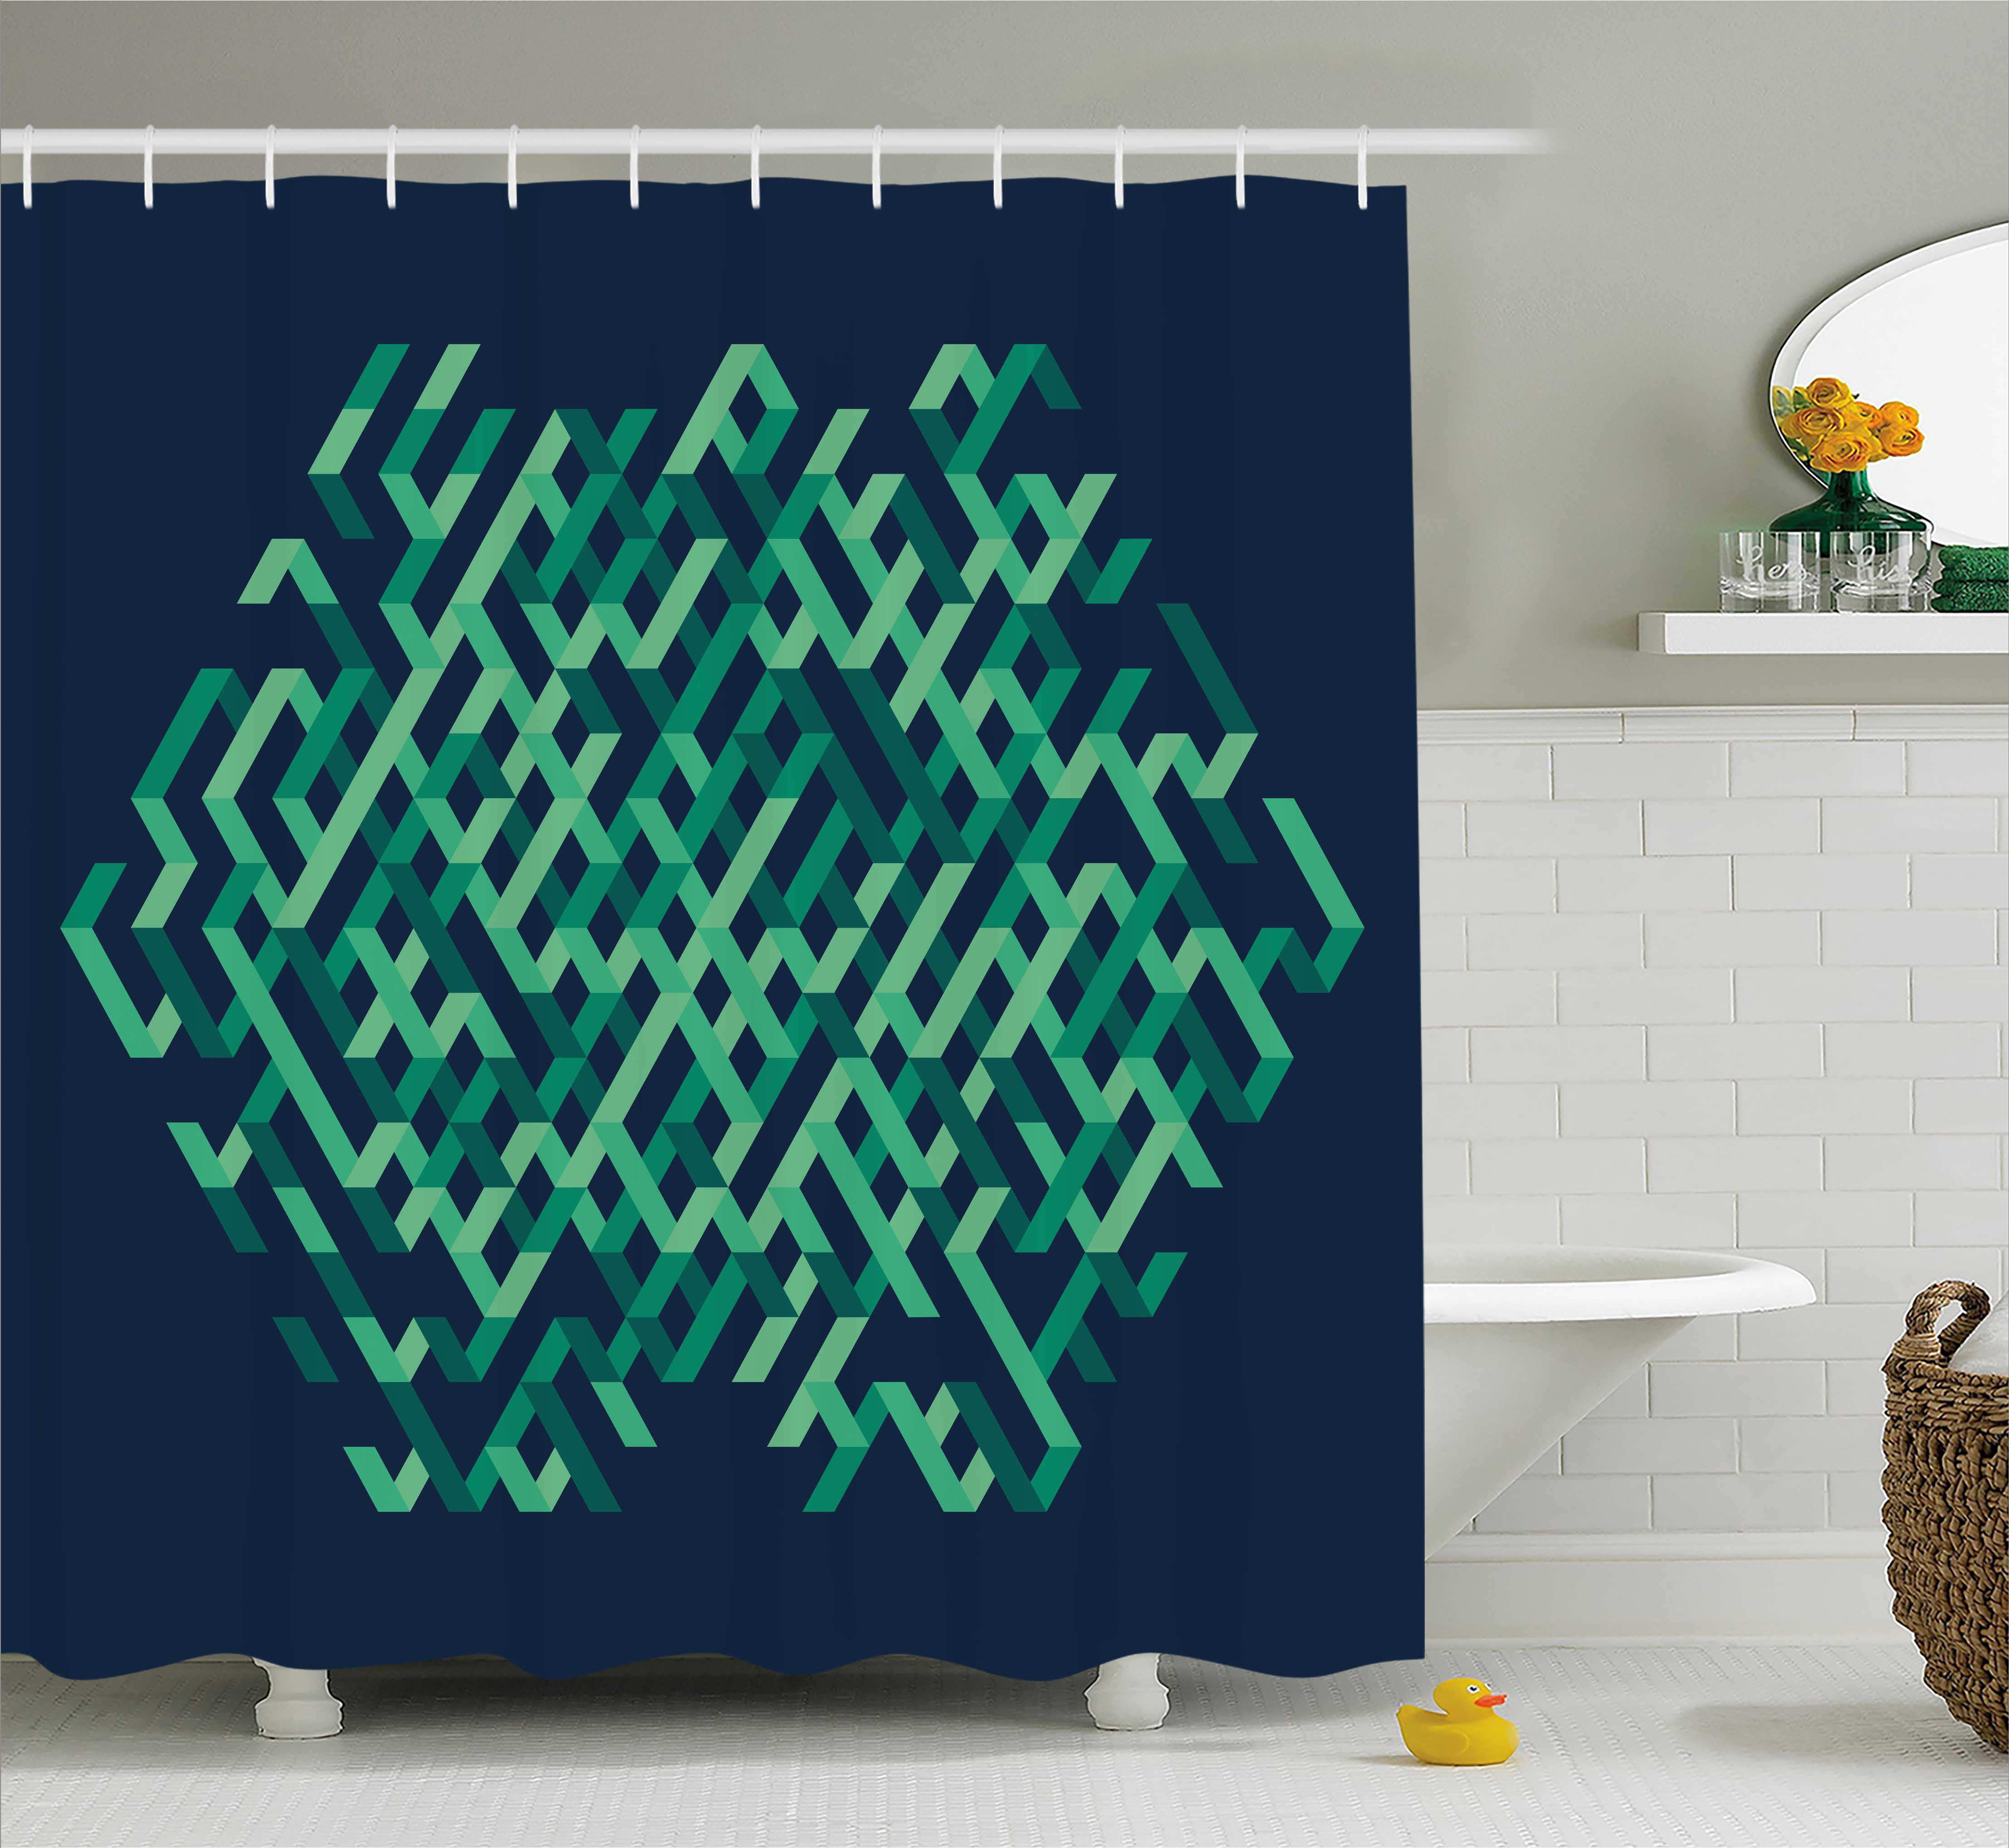 Modern Fabric Shower Curtain Fabric Bathroom Decor Set With